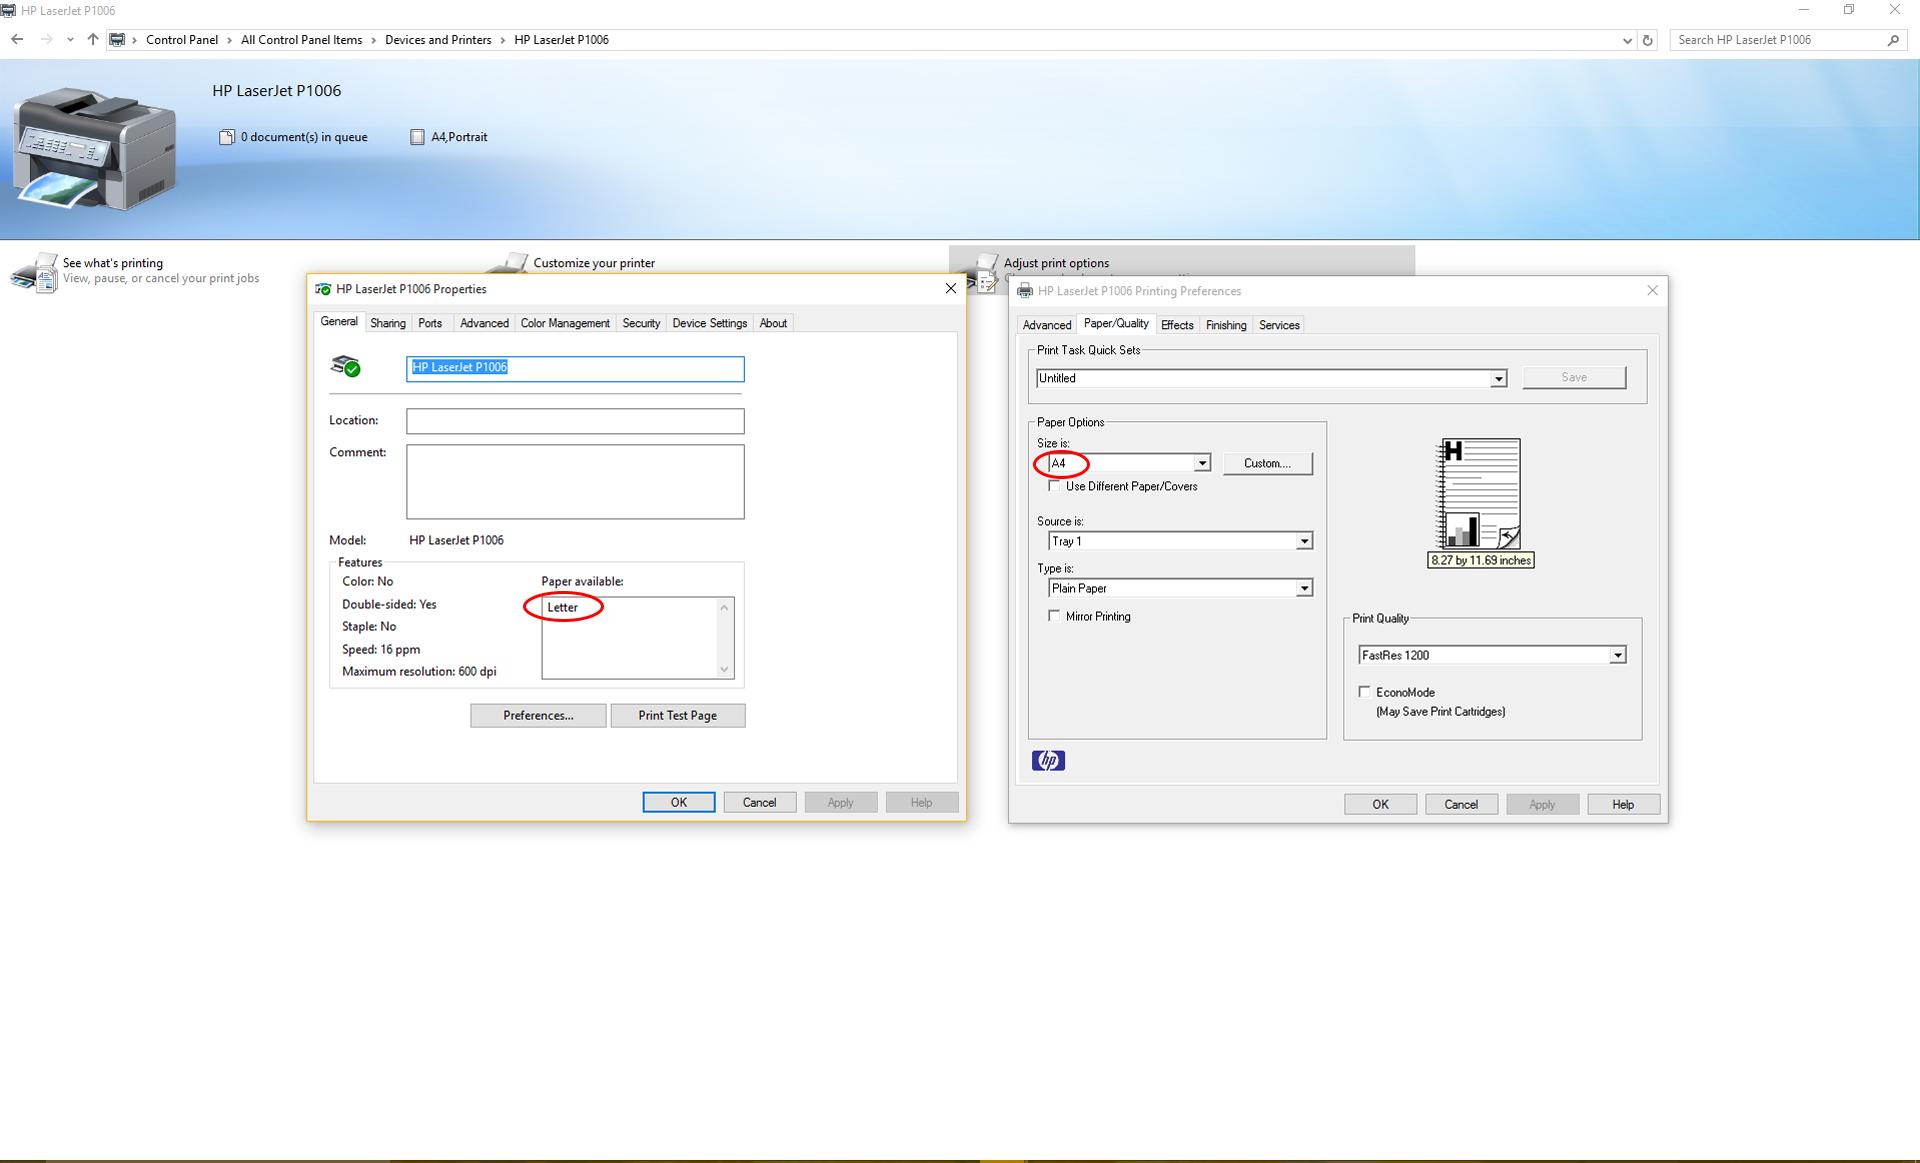 Color printing in windows 10 - Screenshot